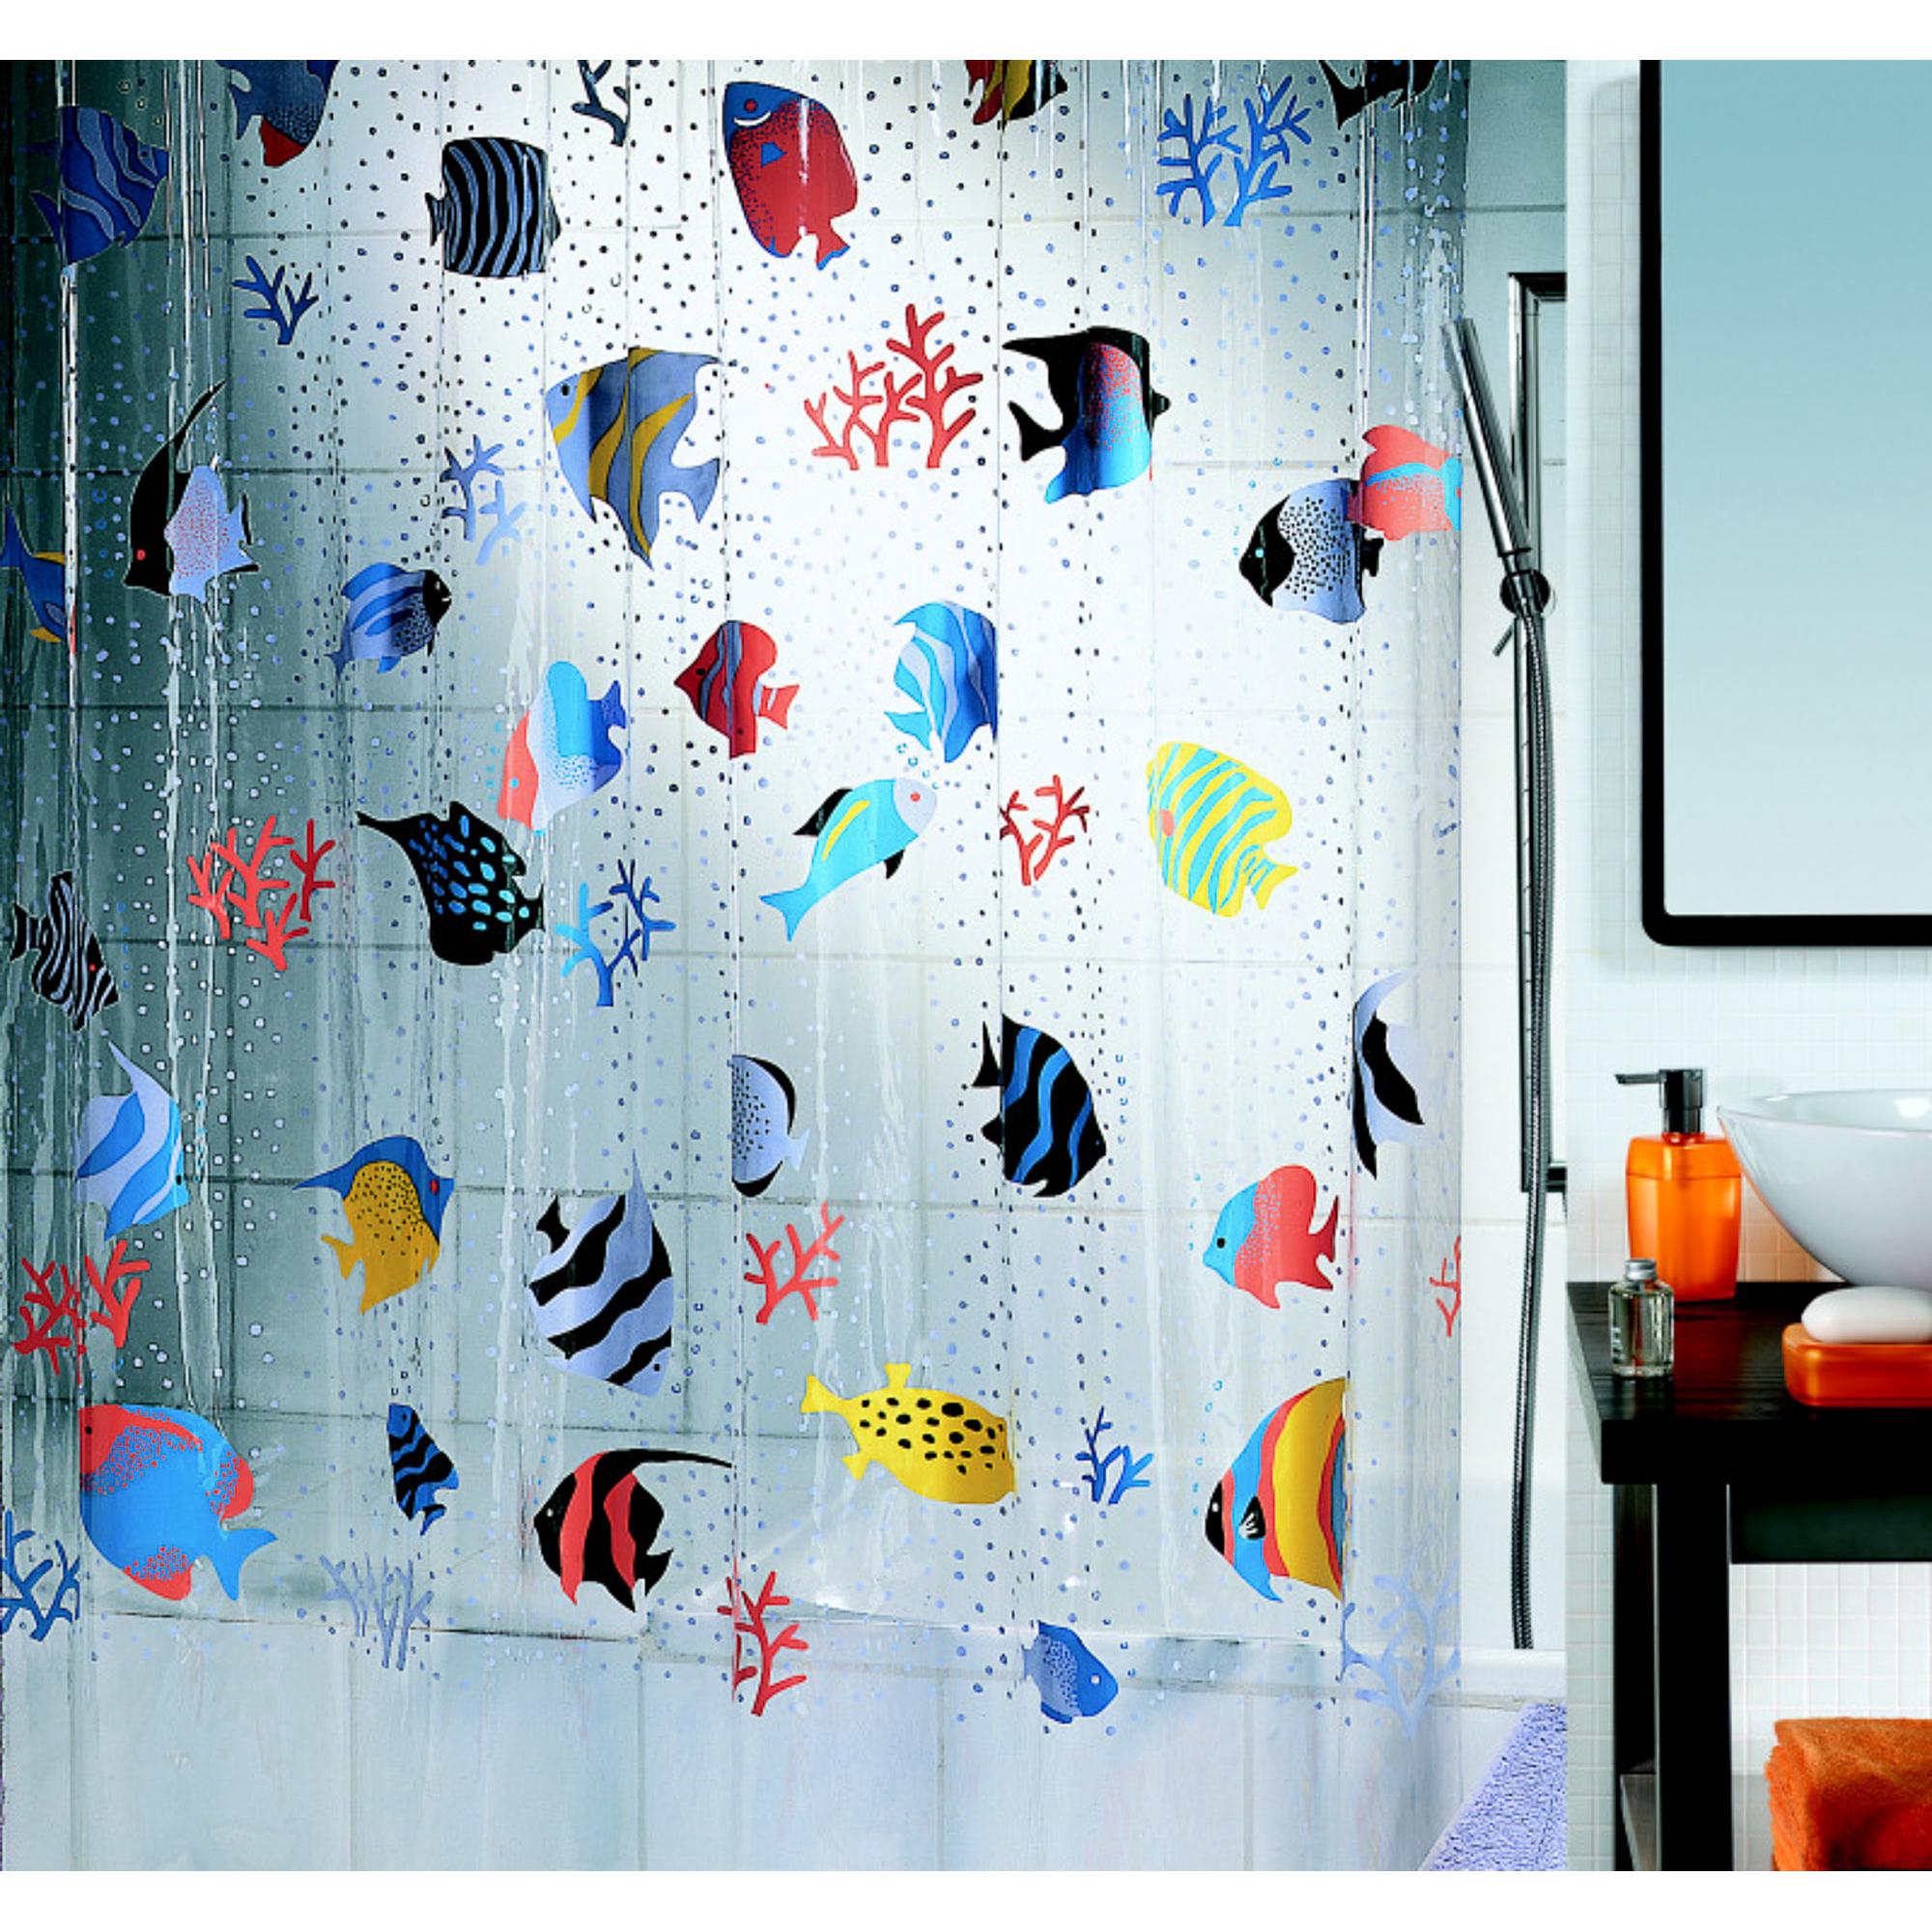 Штора для ванной Spirella Fish 180х200 см штора для ванной joyarty слон и птица 180х200 sc 6079